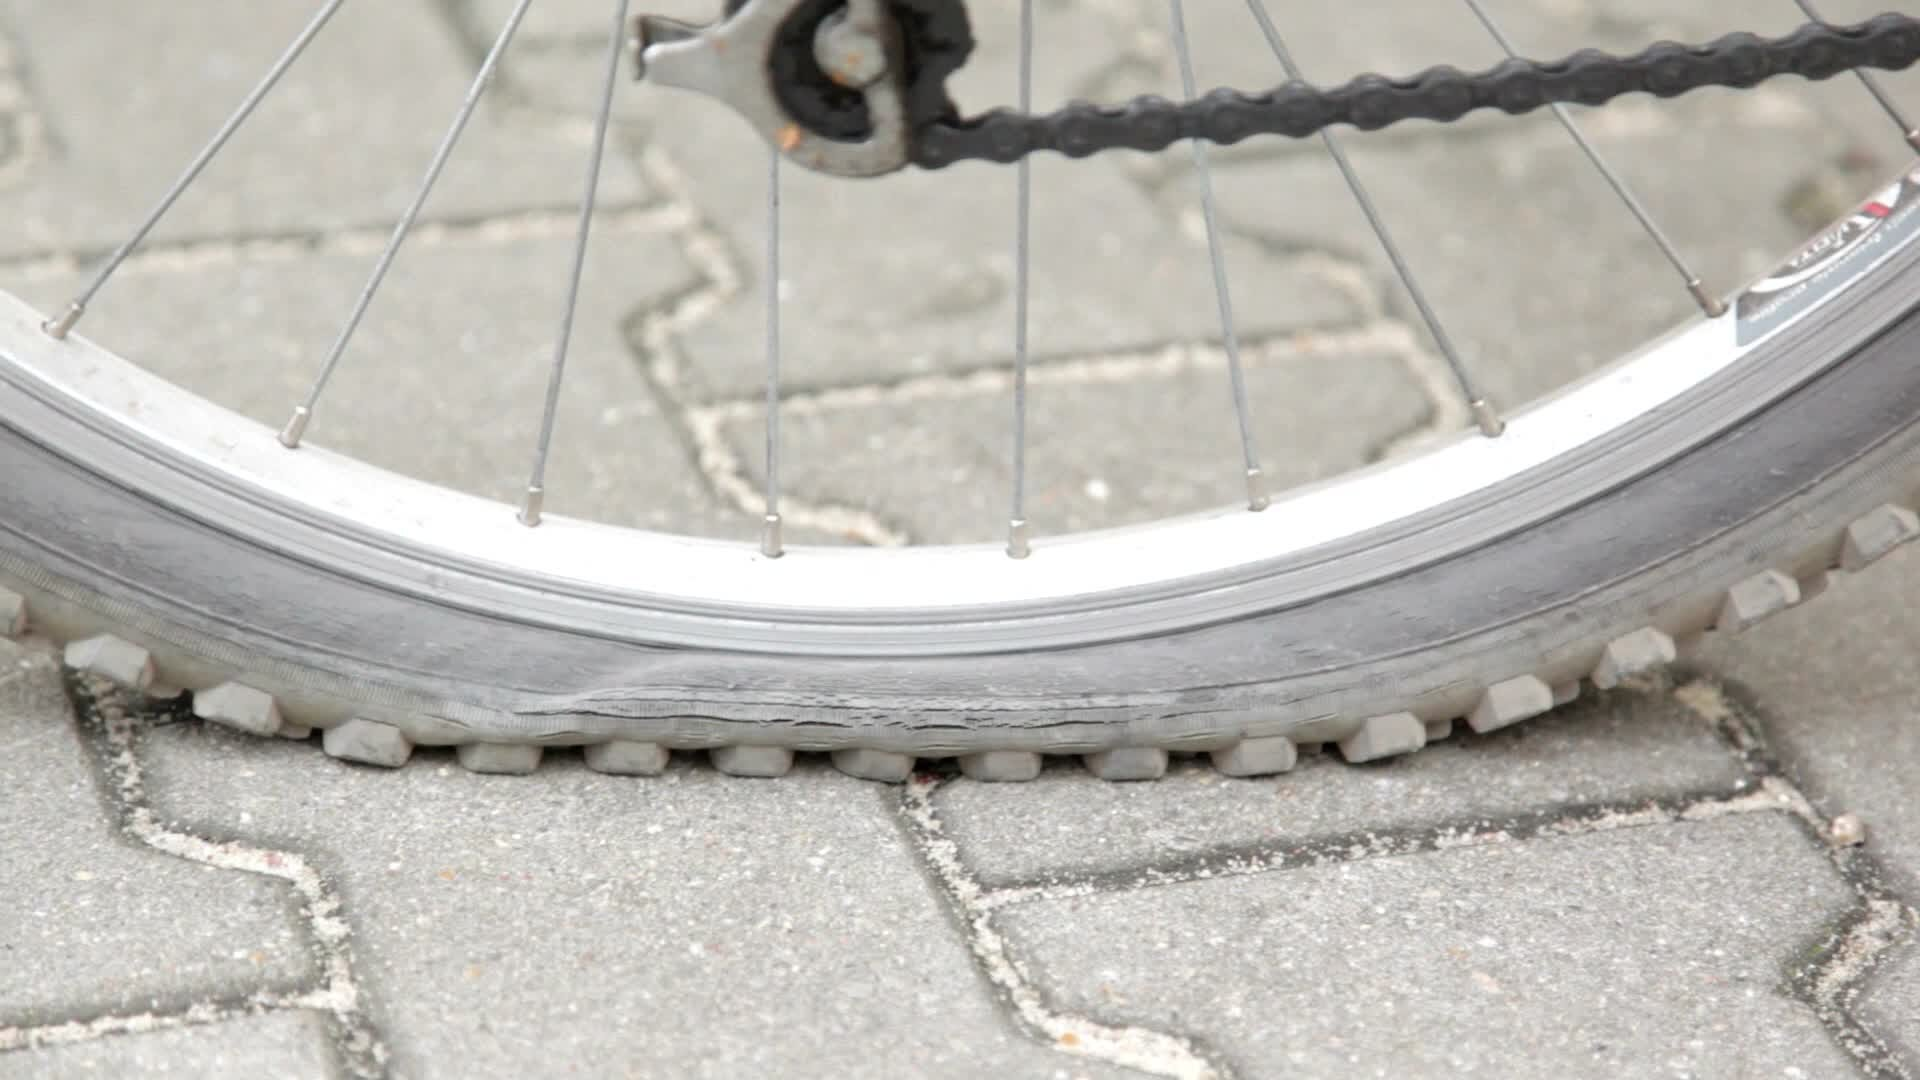 Fahrrad Reparieren Wann Selber Machen Wann Zum Fachmann